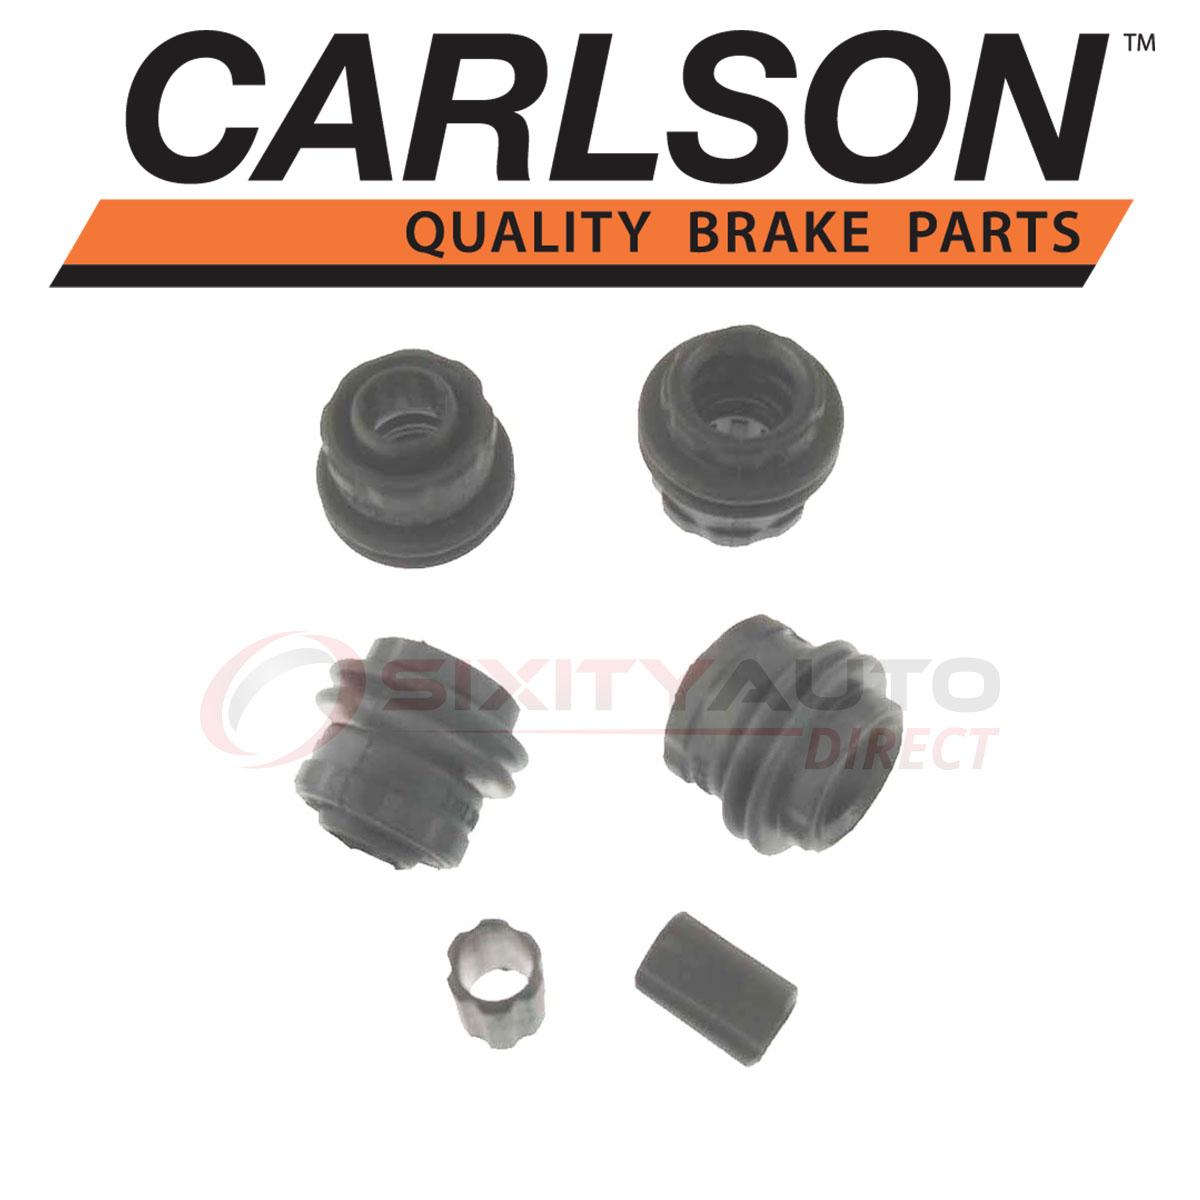 Carlson Brake 16175 Rear Pin Boot Kit Manufacturers Limited Warranty